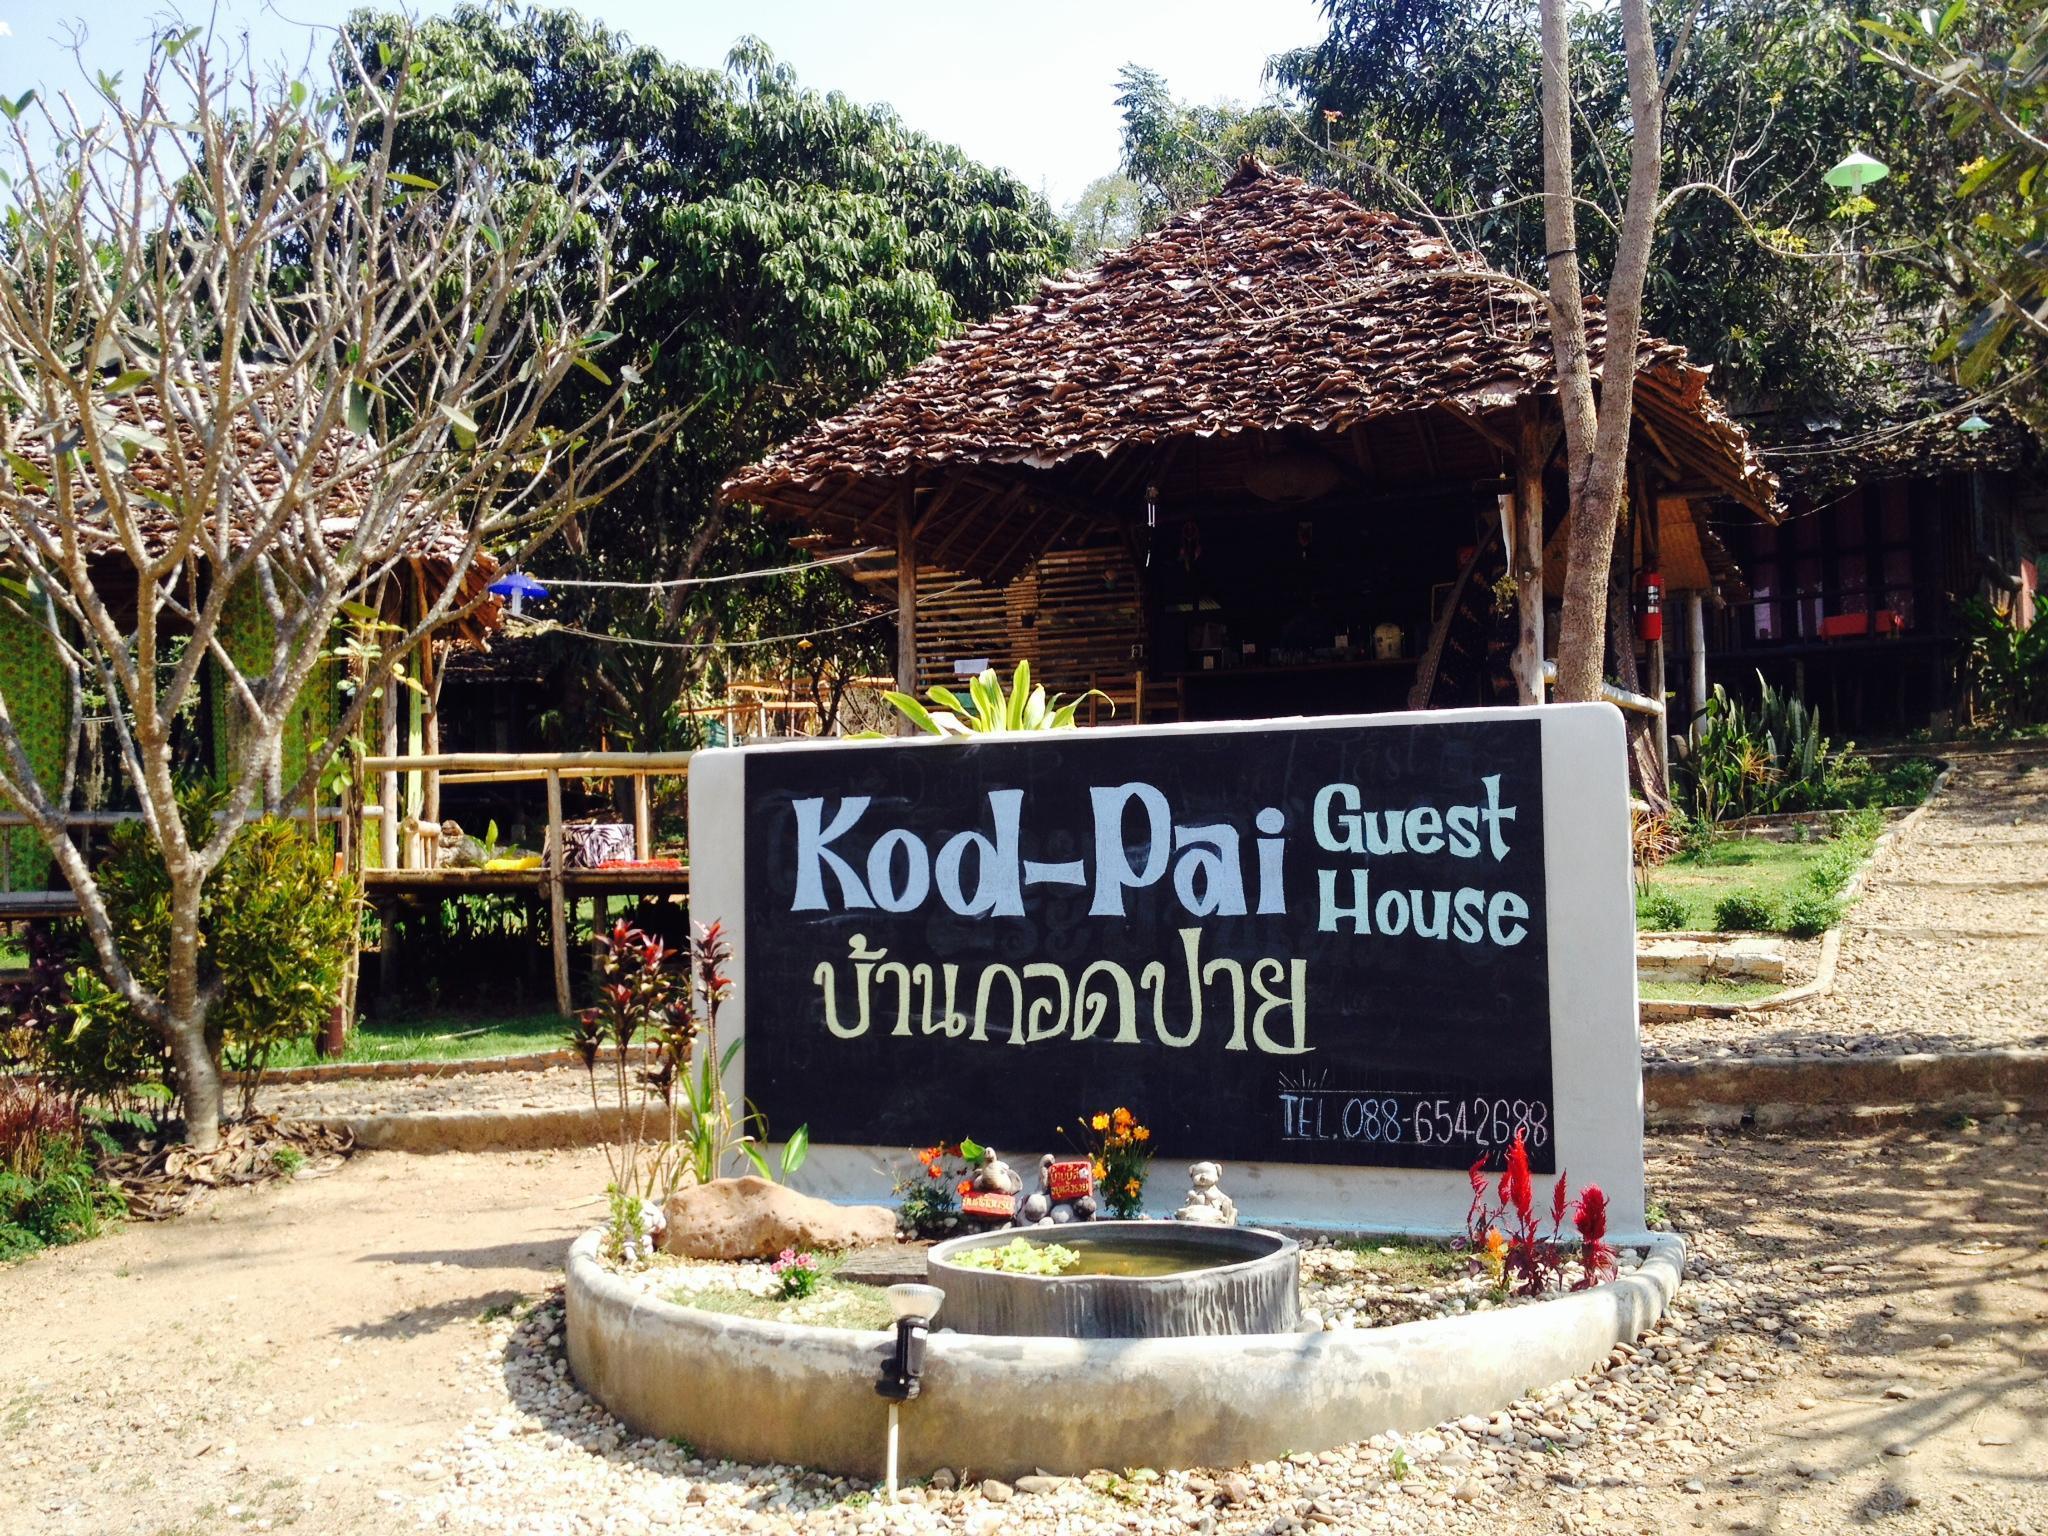 Kod Pai Guest House